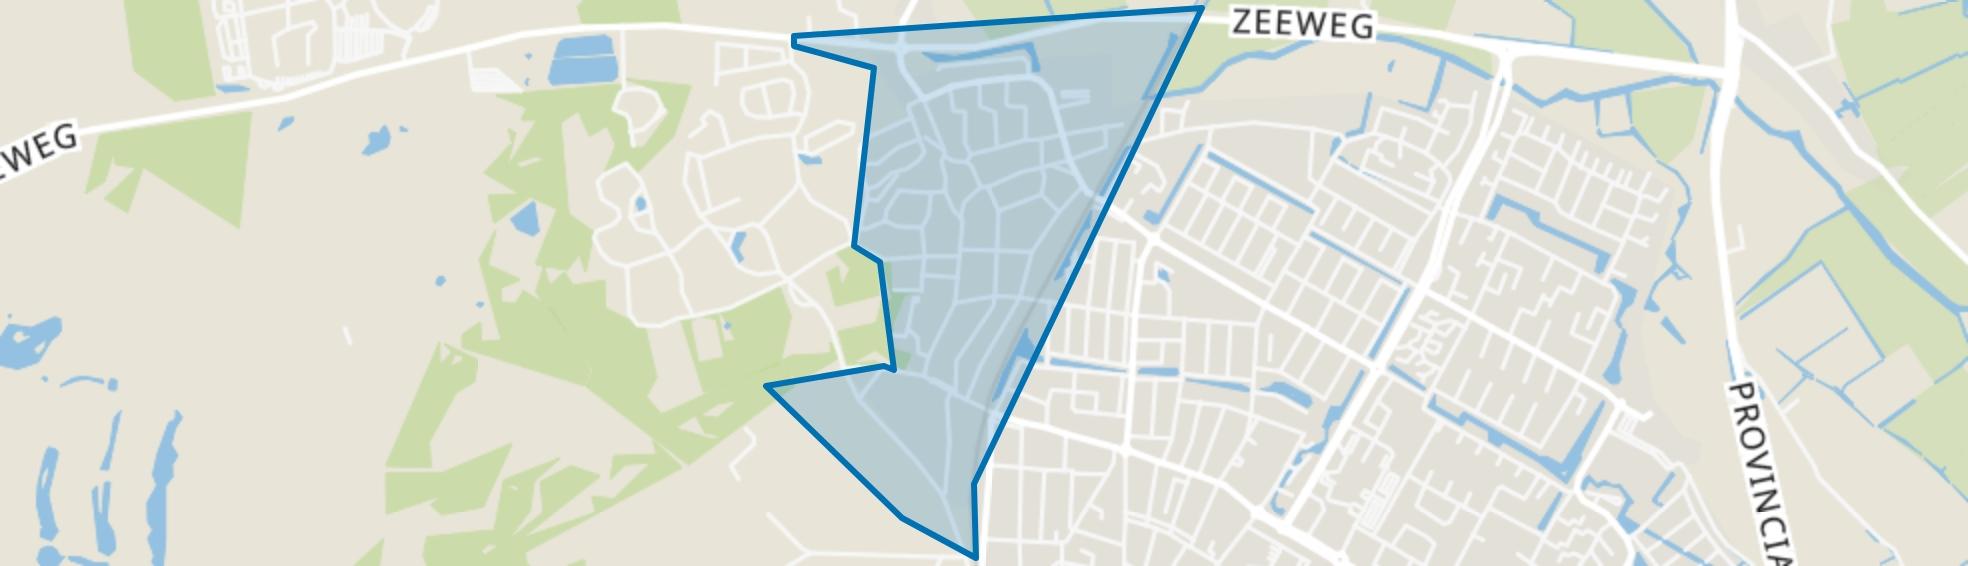 Bakkum-Zuid, Castricum map